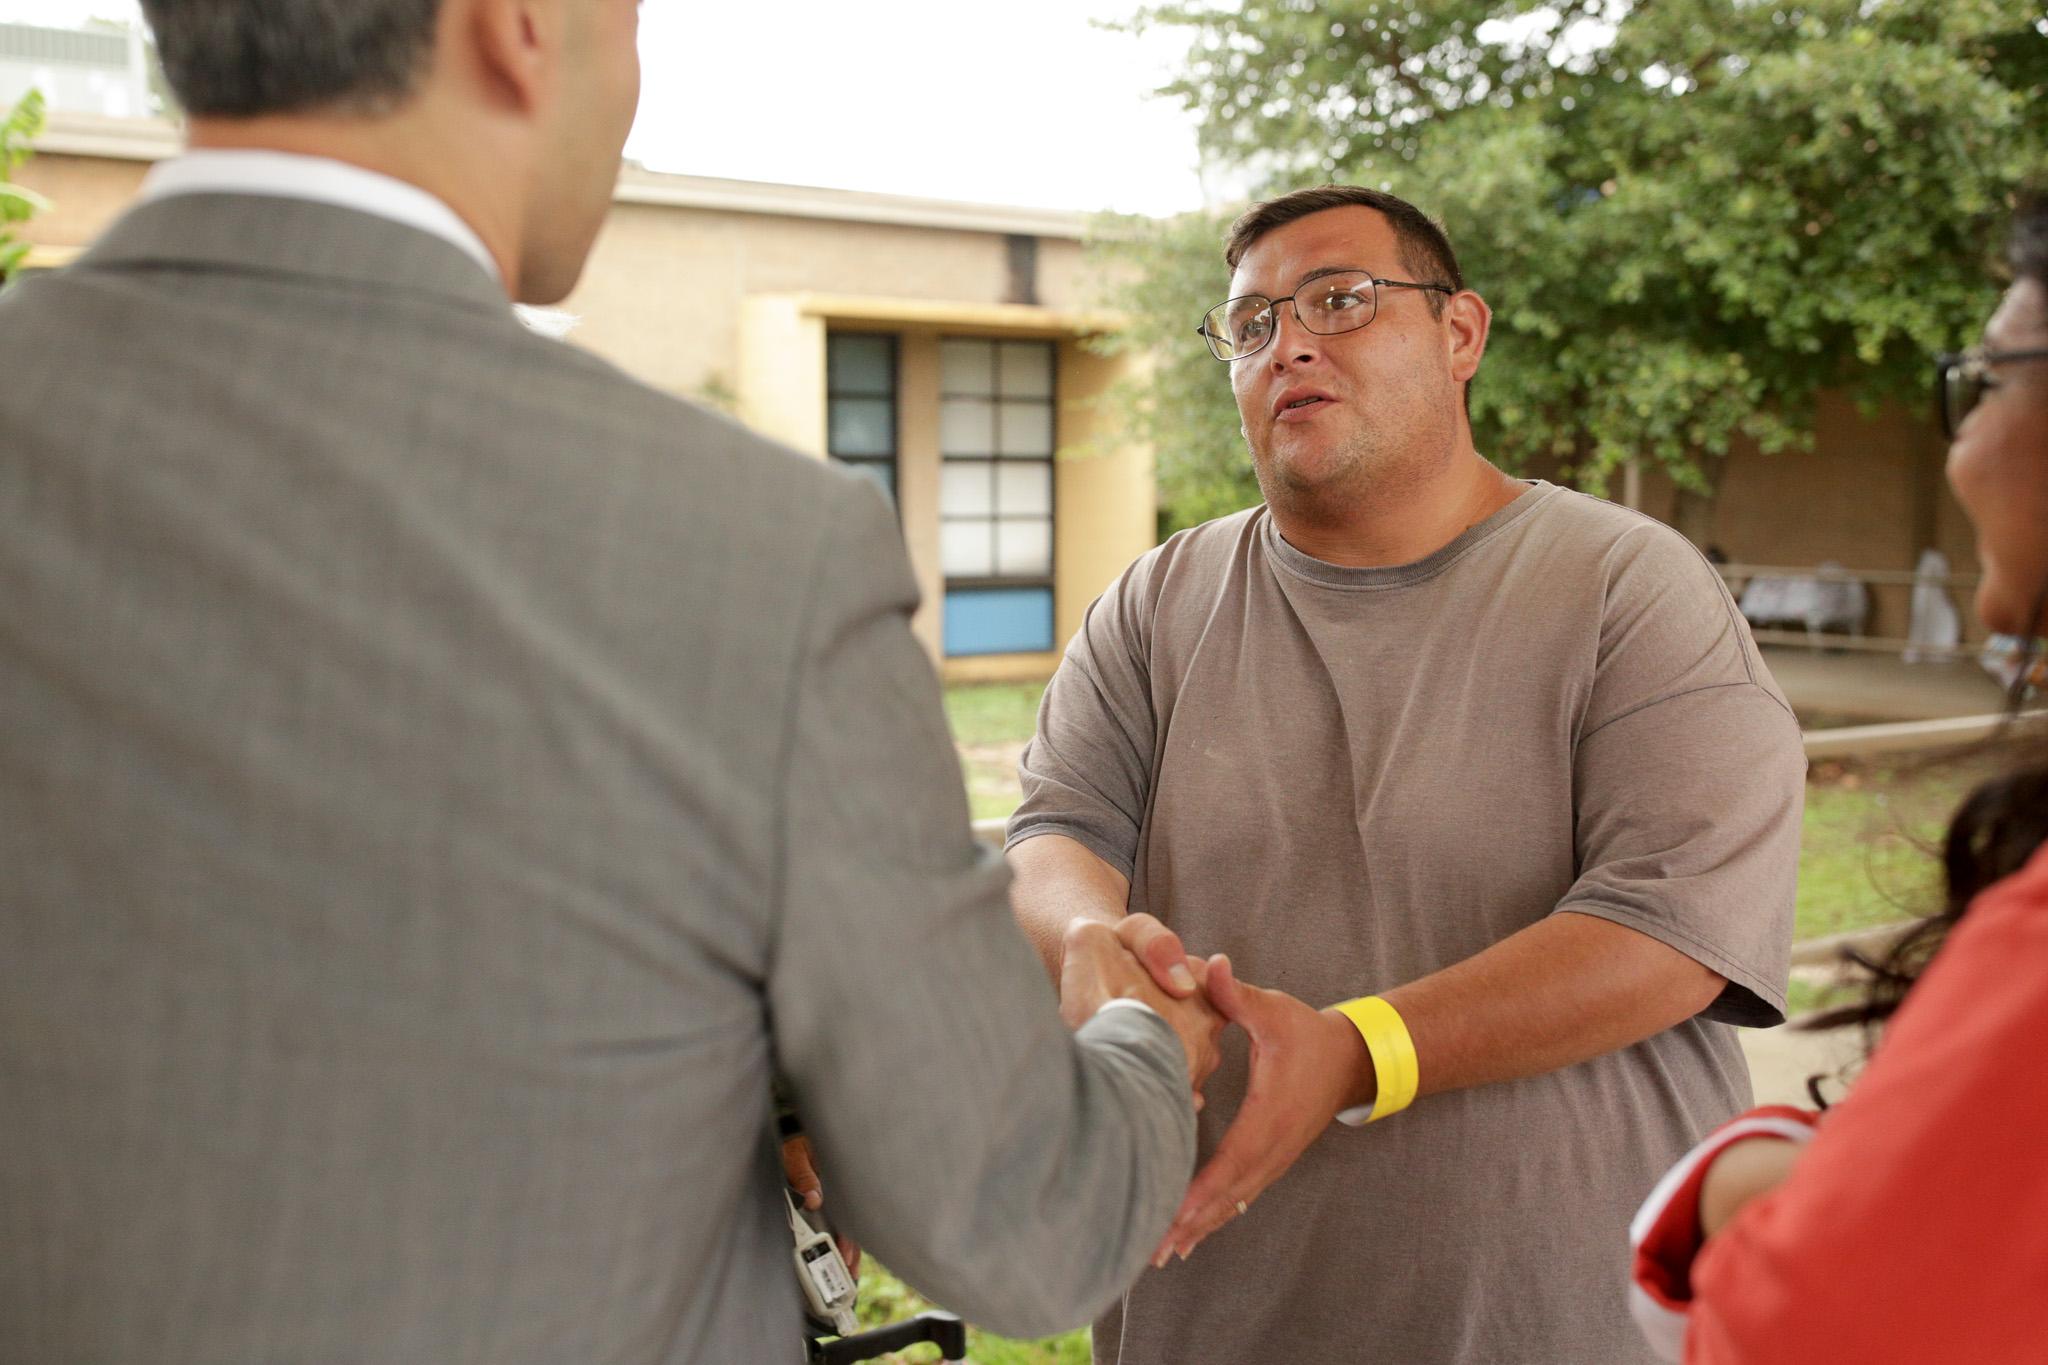 Corpus Christi evacuee Salvador Esparza thanks Mayor Nirenberg for the city's response to the disaster.